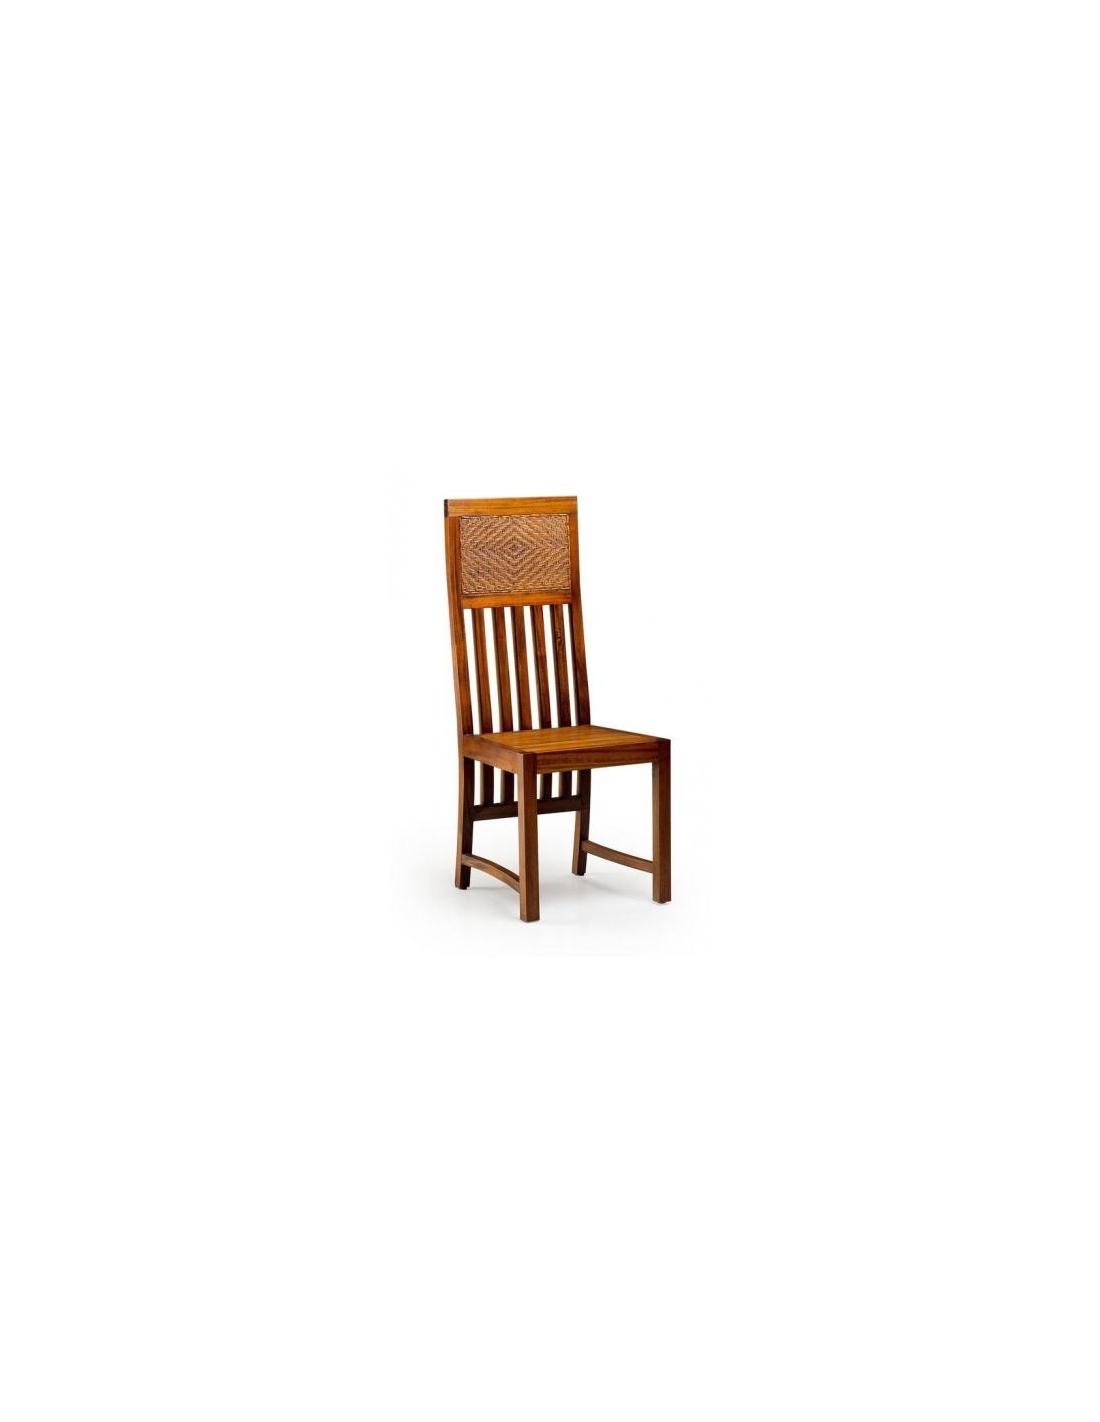 Comprar silla barrotes verticales rattan for Sillas rattan comedor